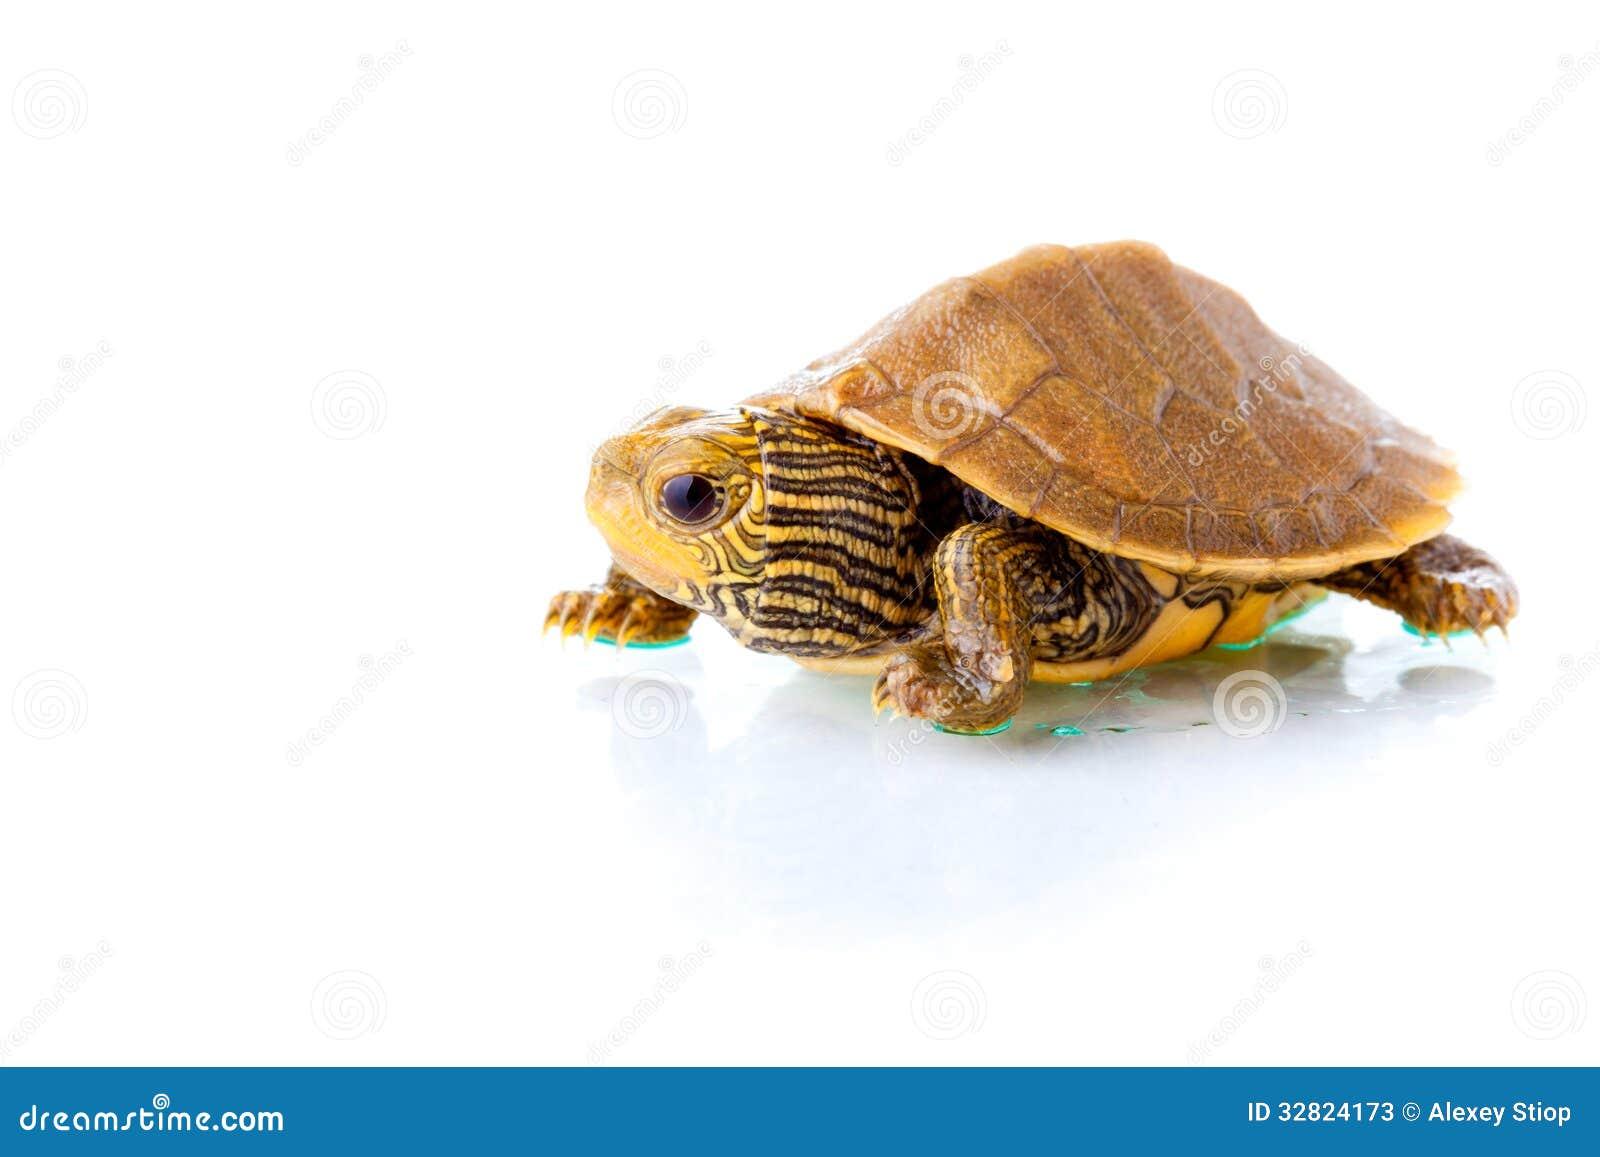 turtle white background - photo #17